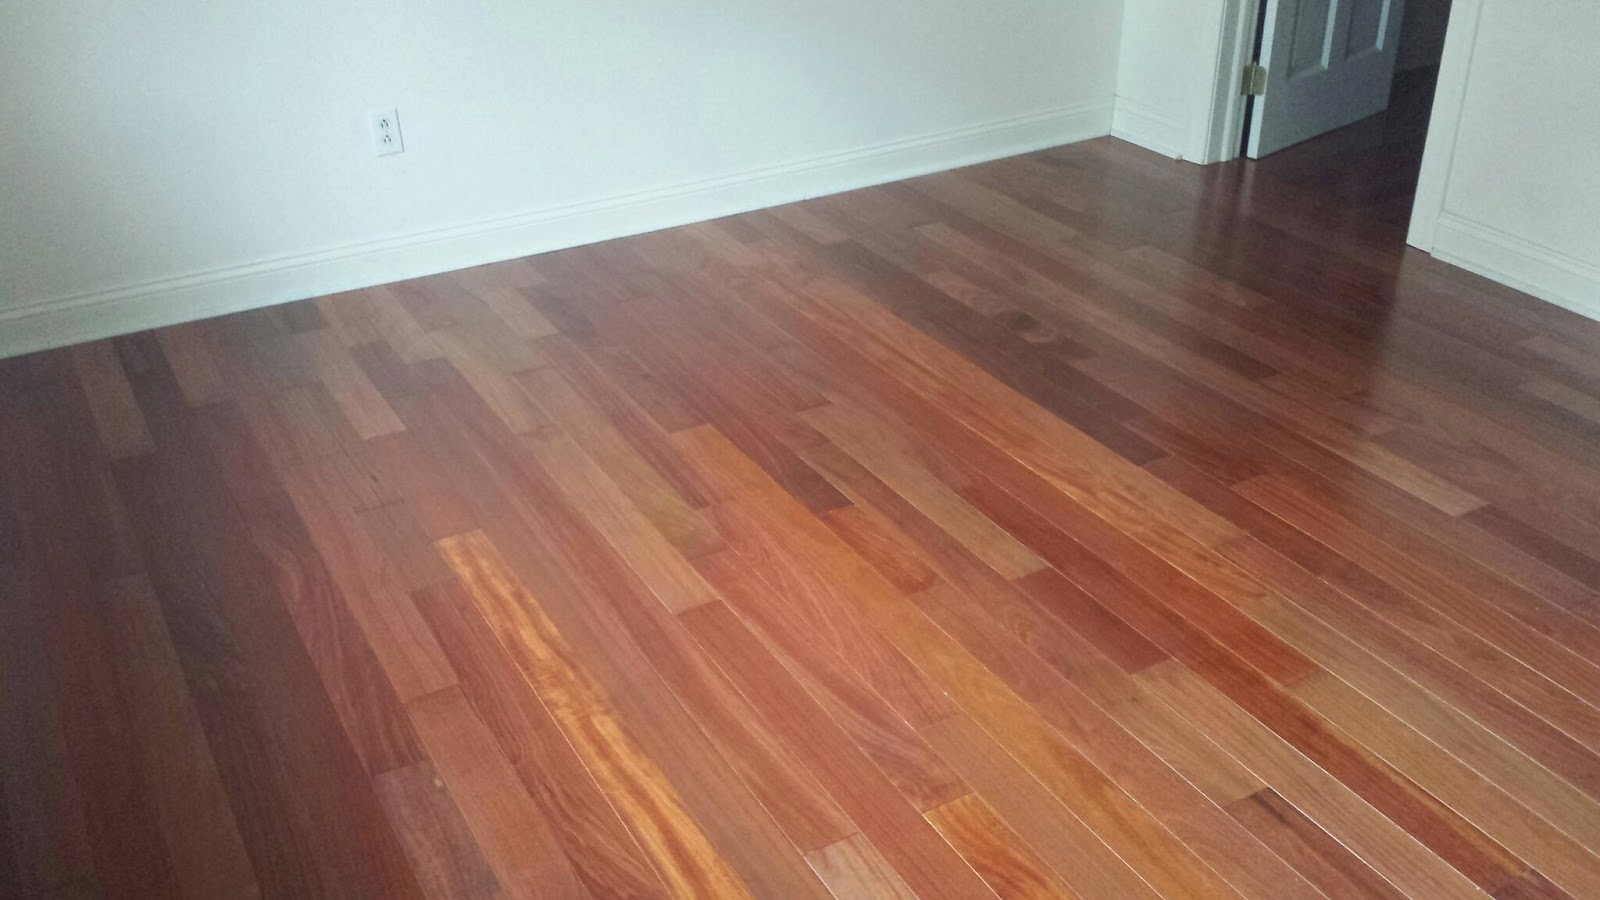 Hardwood Flooring Suppliers New Jersey Carpet Vidalondon